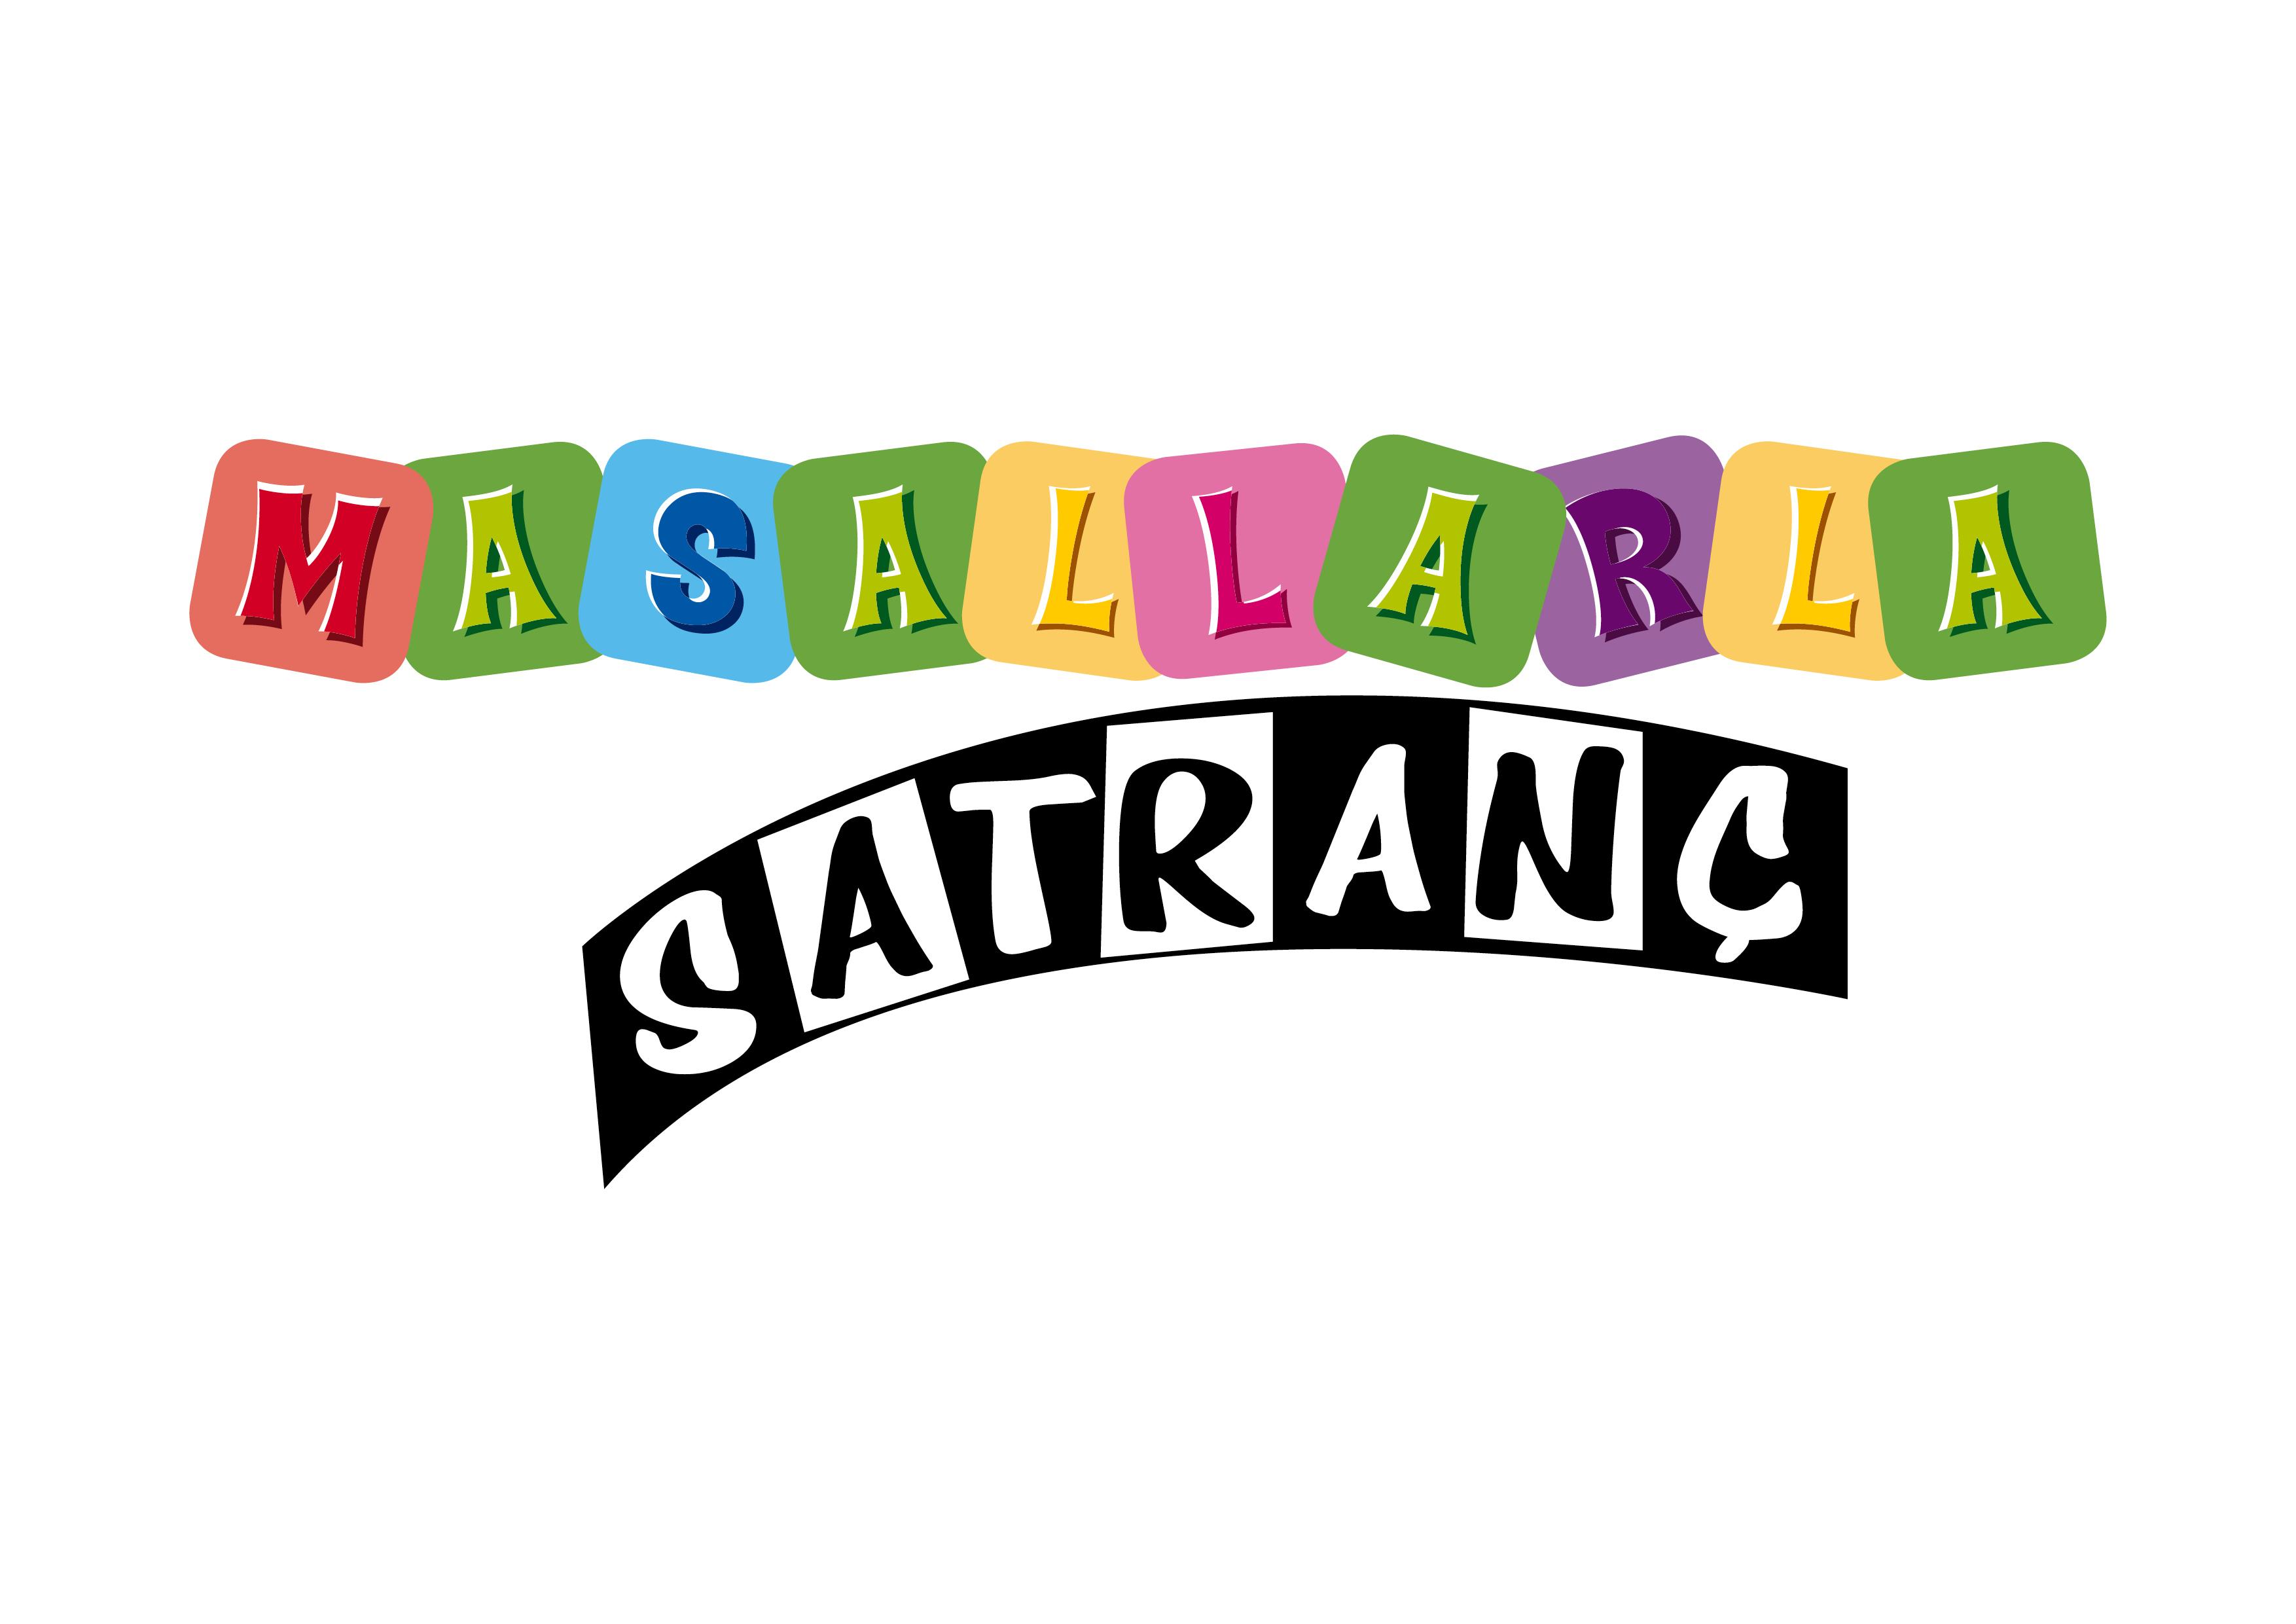 Masallarla Satranç Logo